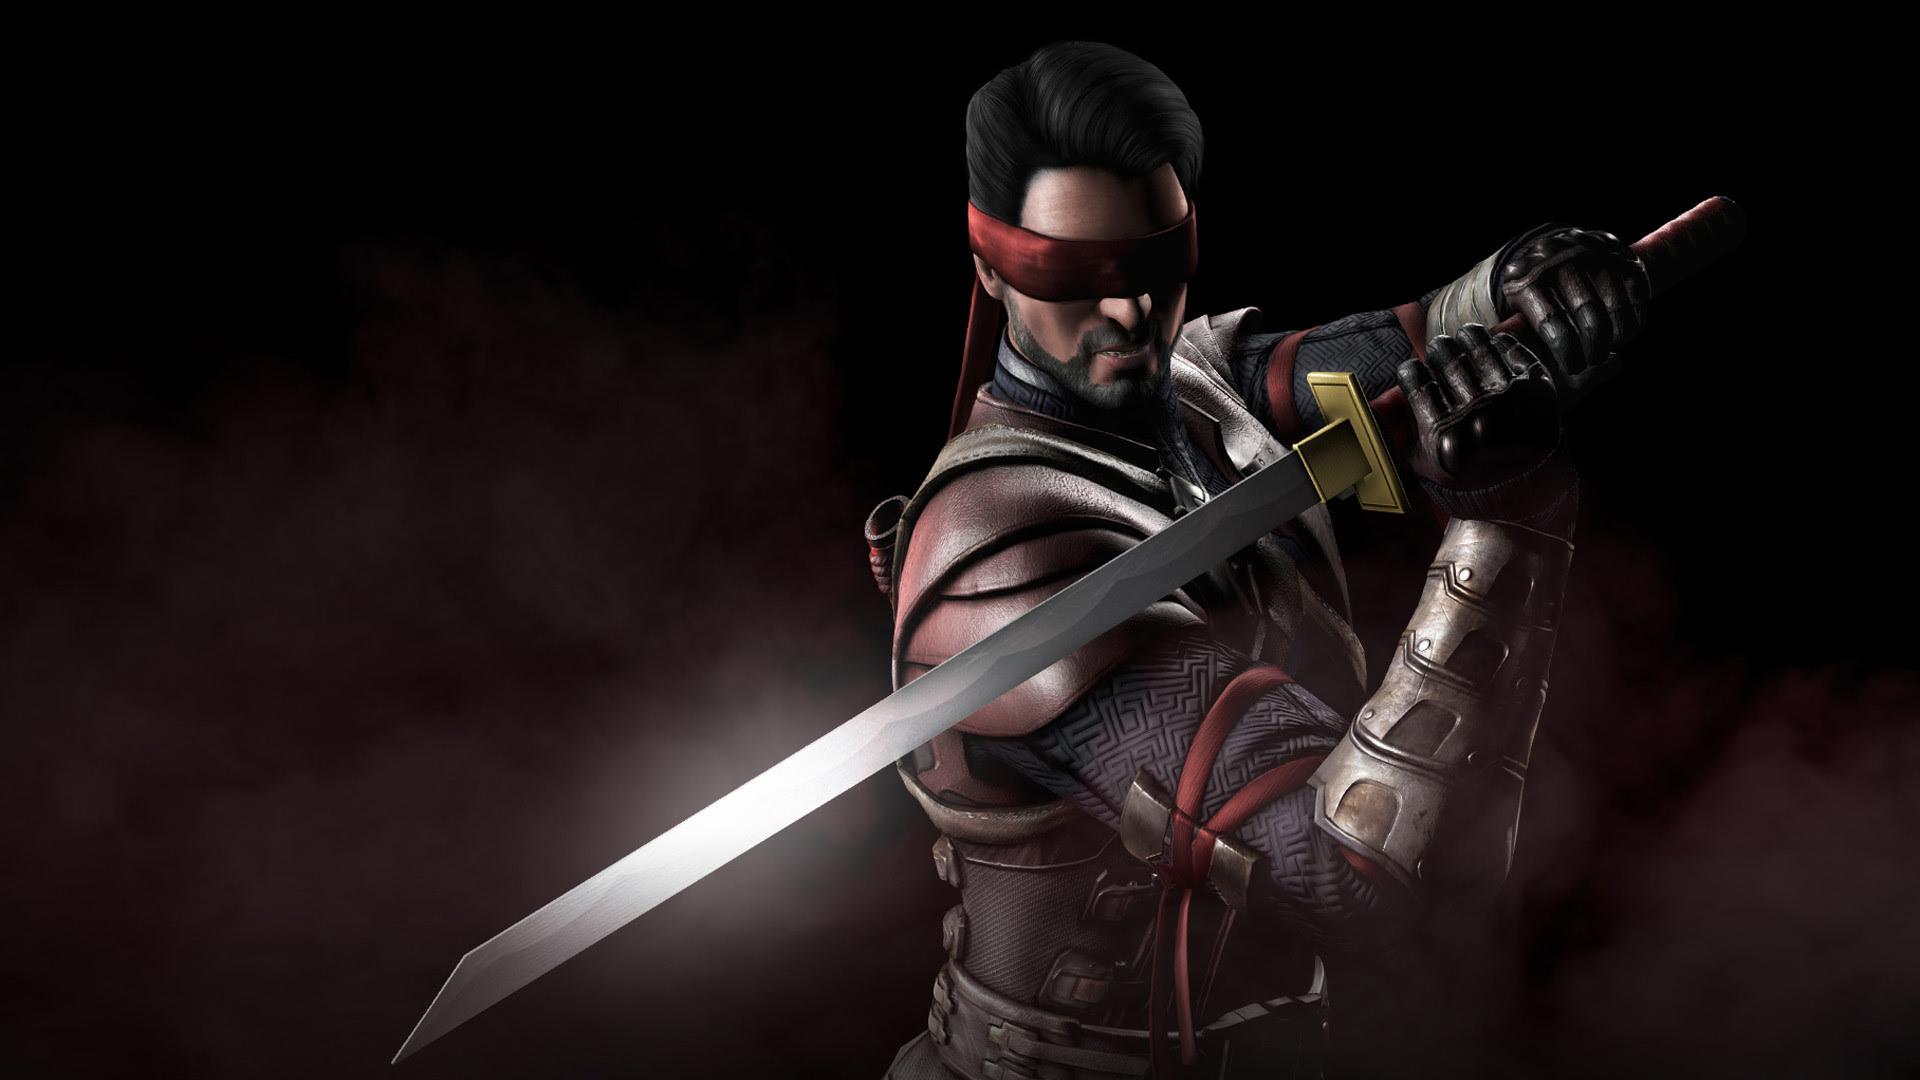 Mortal Kombat X Iphone Wallpaper 70 Images